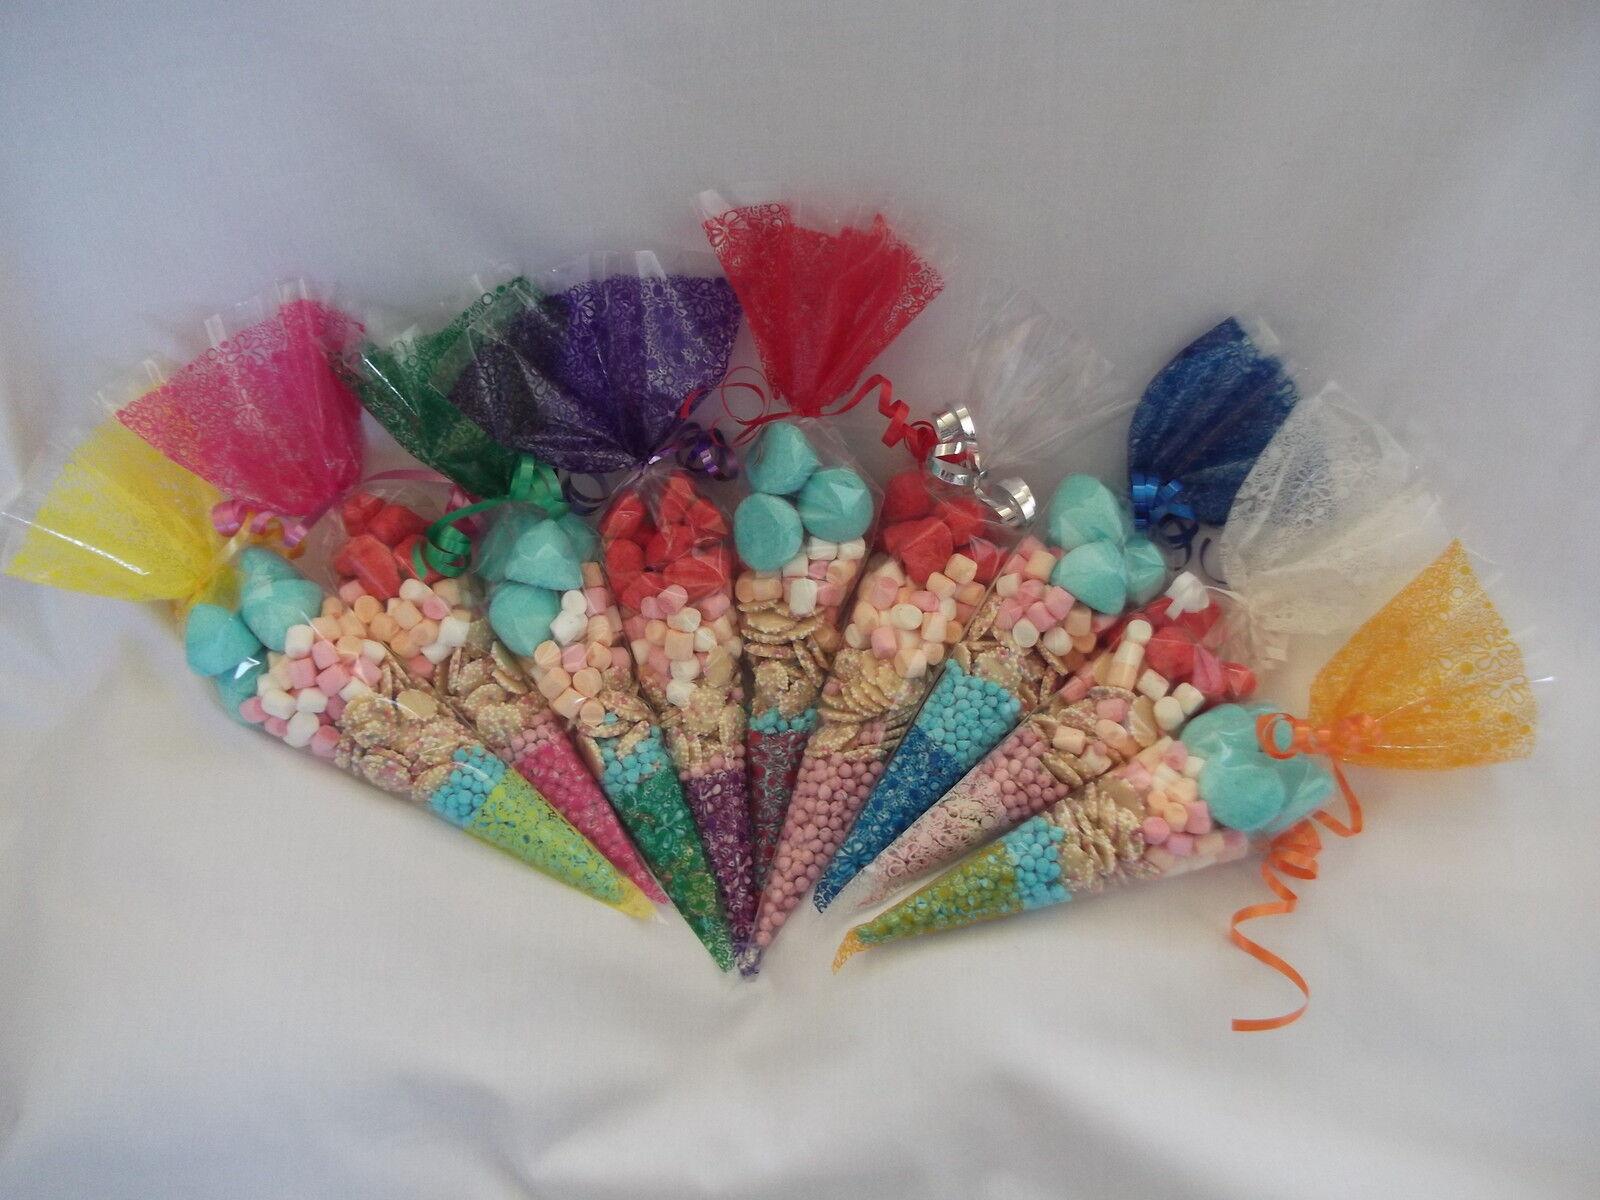 Cone Cello  Empty Party Gift Sweet Treat Favor Bags 37 x 18cm & 8cm Twist Ties